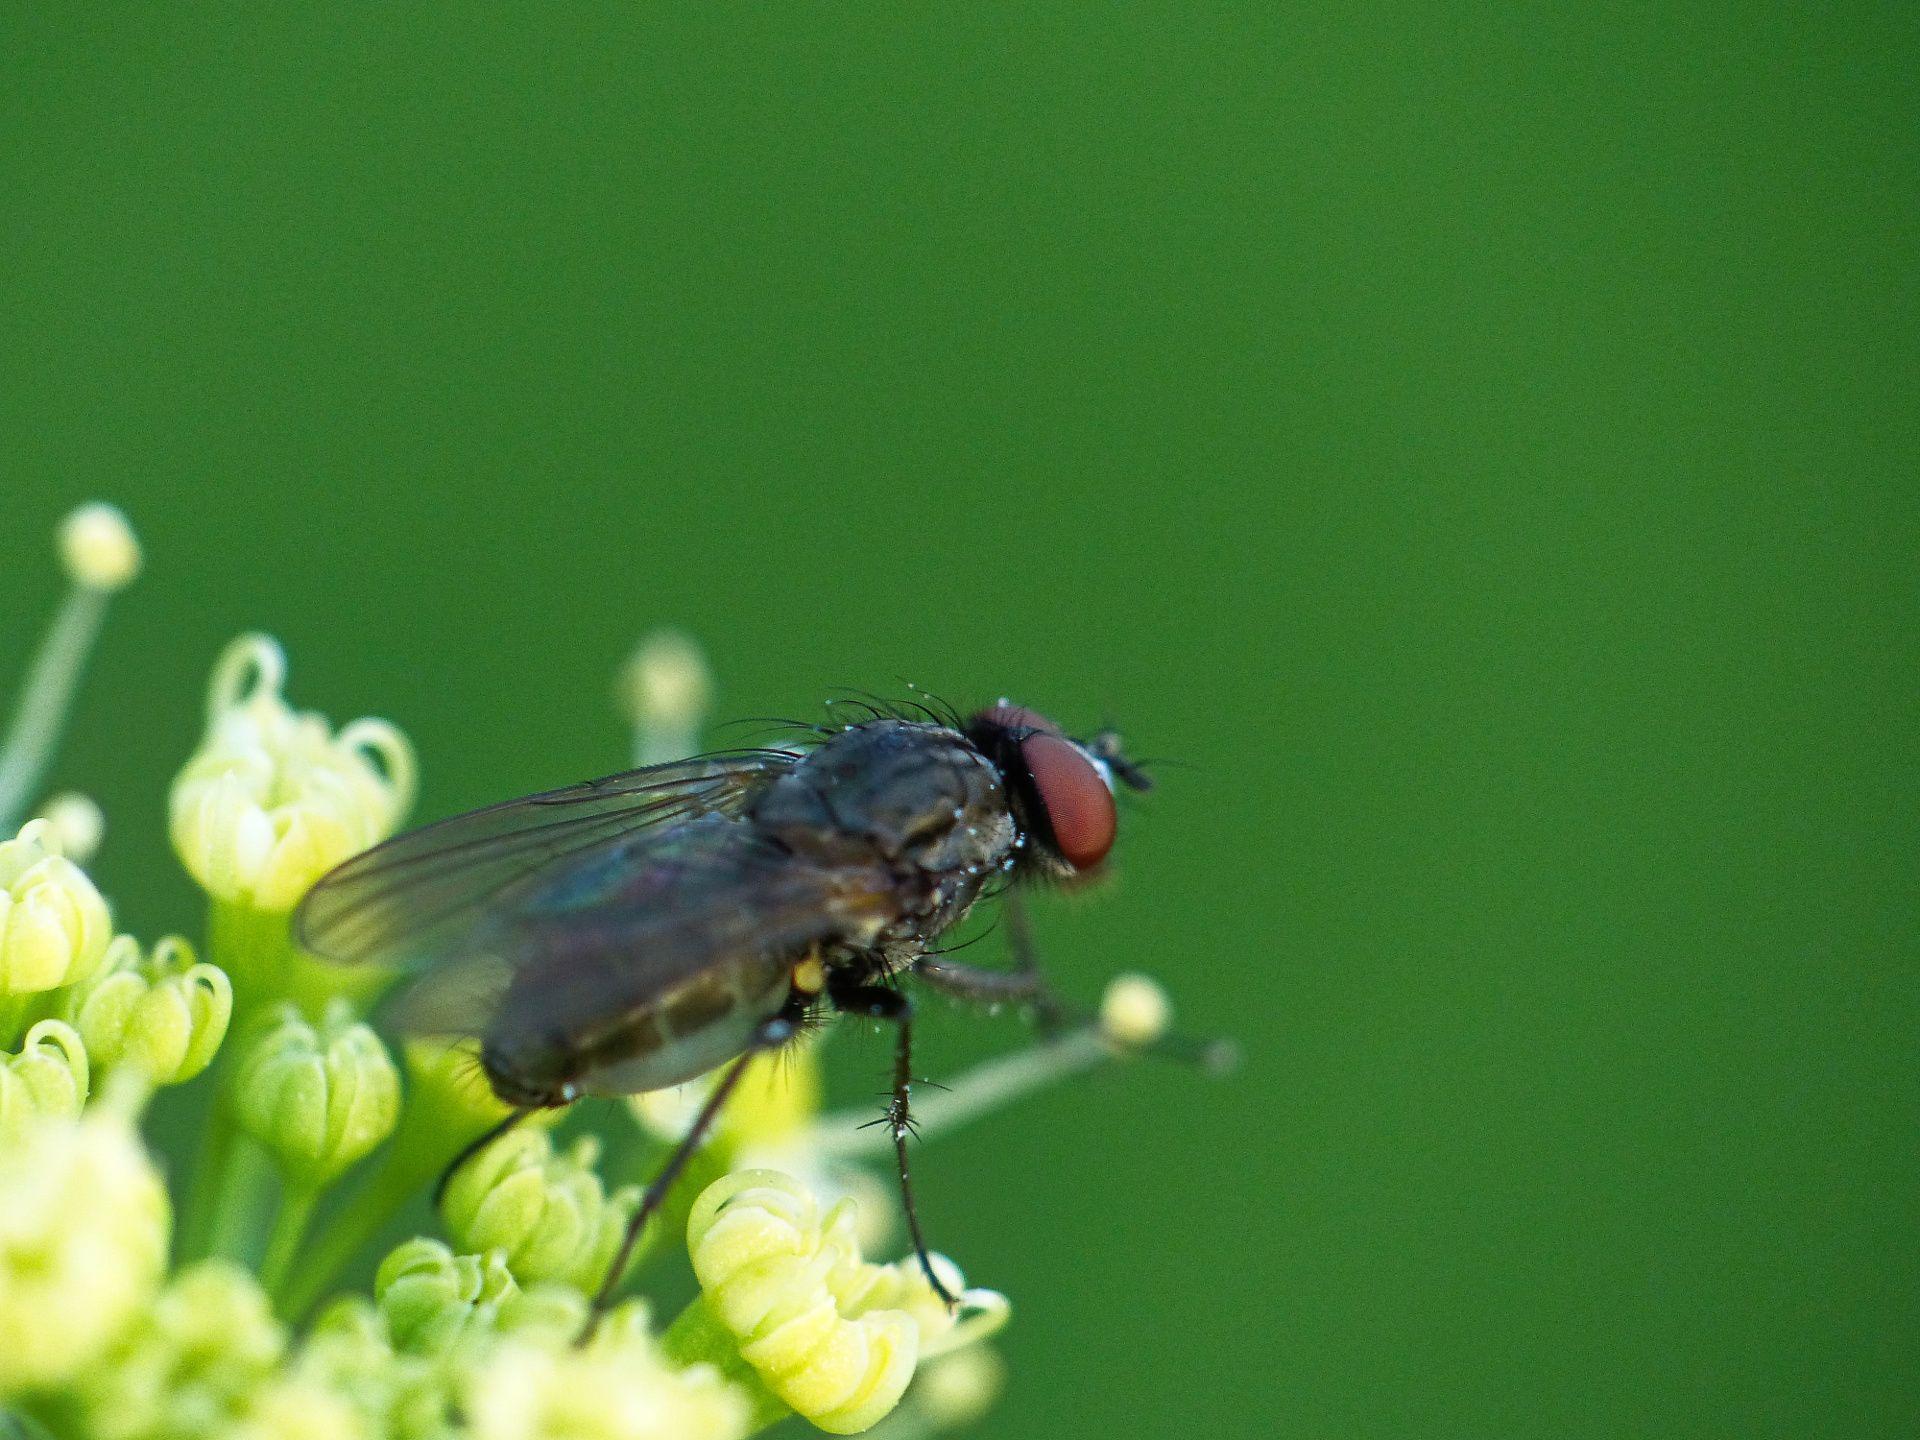 #Fliege in #Nahaufnahme